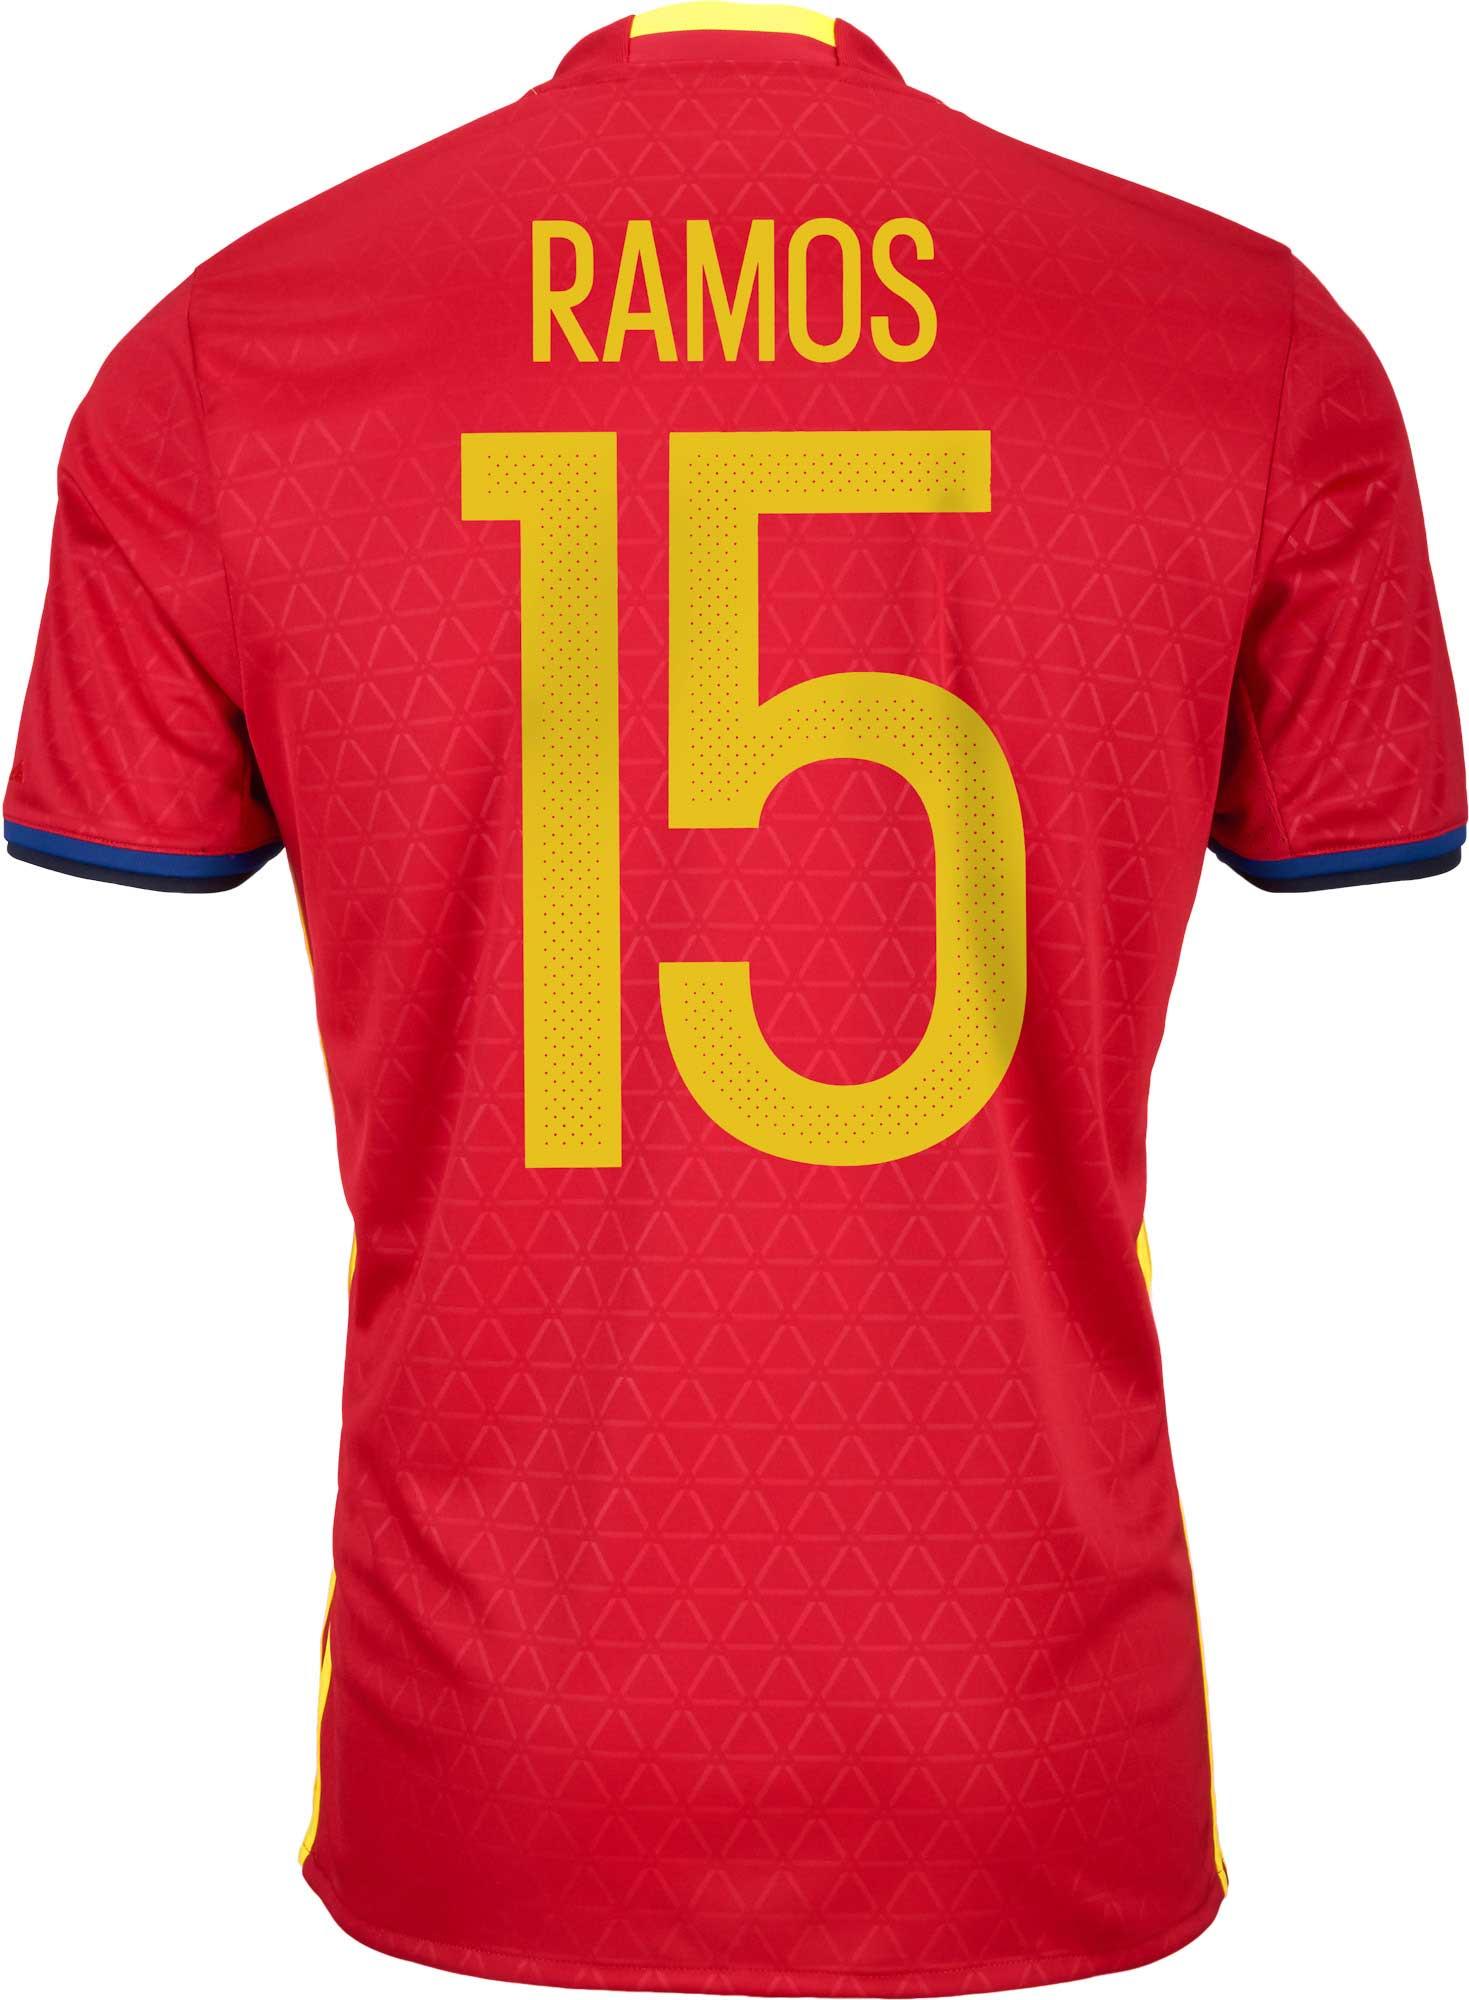 c551519d7 adidas Ramos Spain Home Jersey - 2016 Spain Jerseys